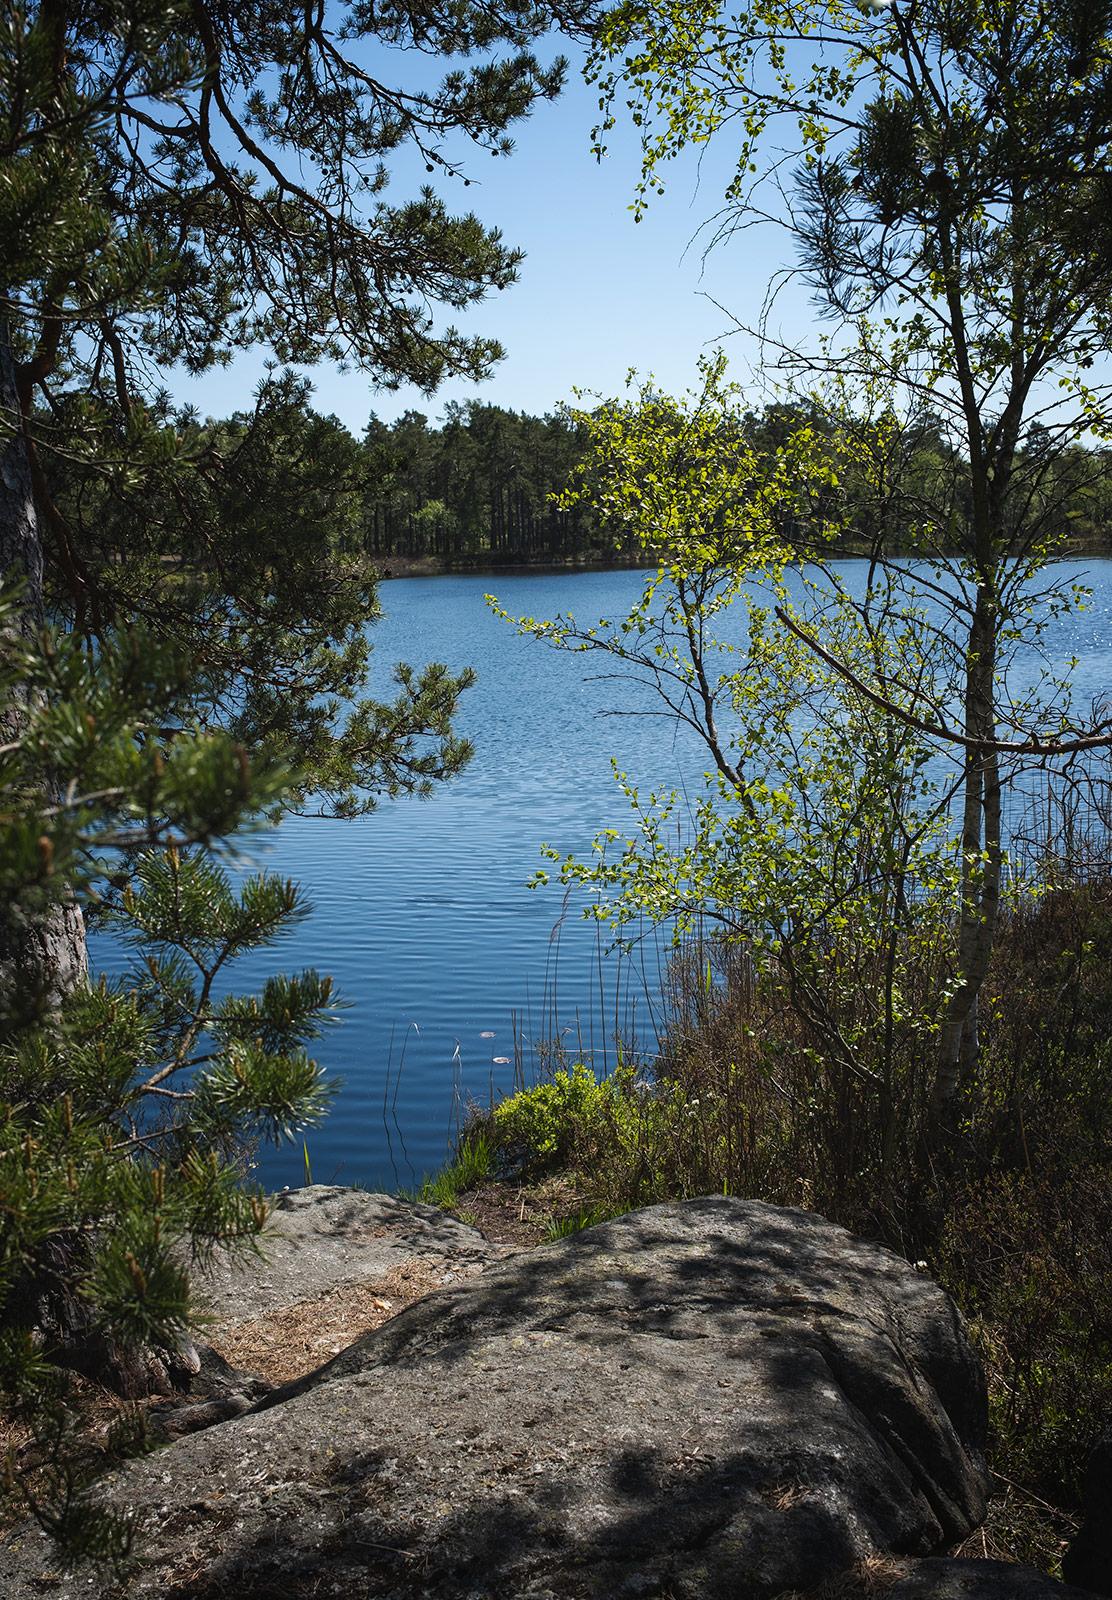 Trees around a lake